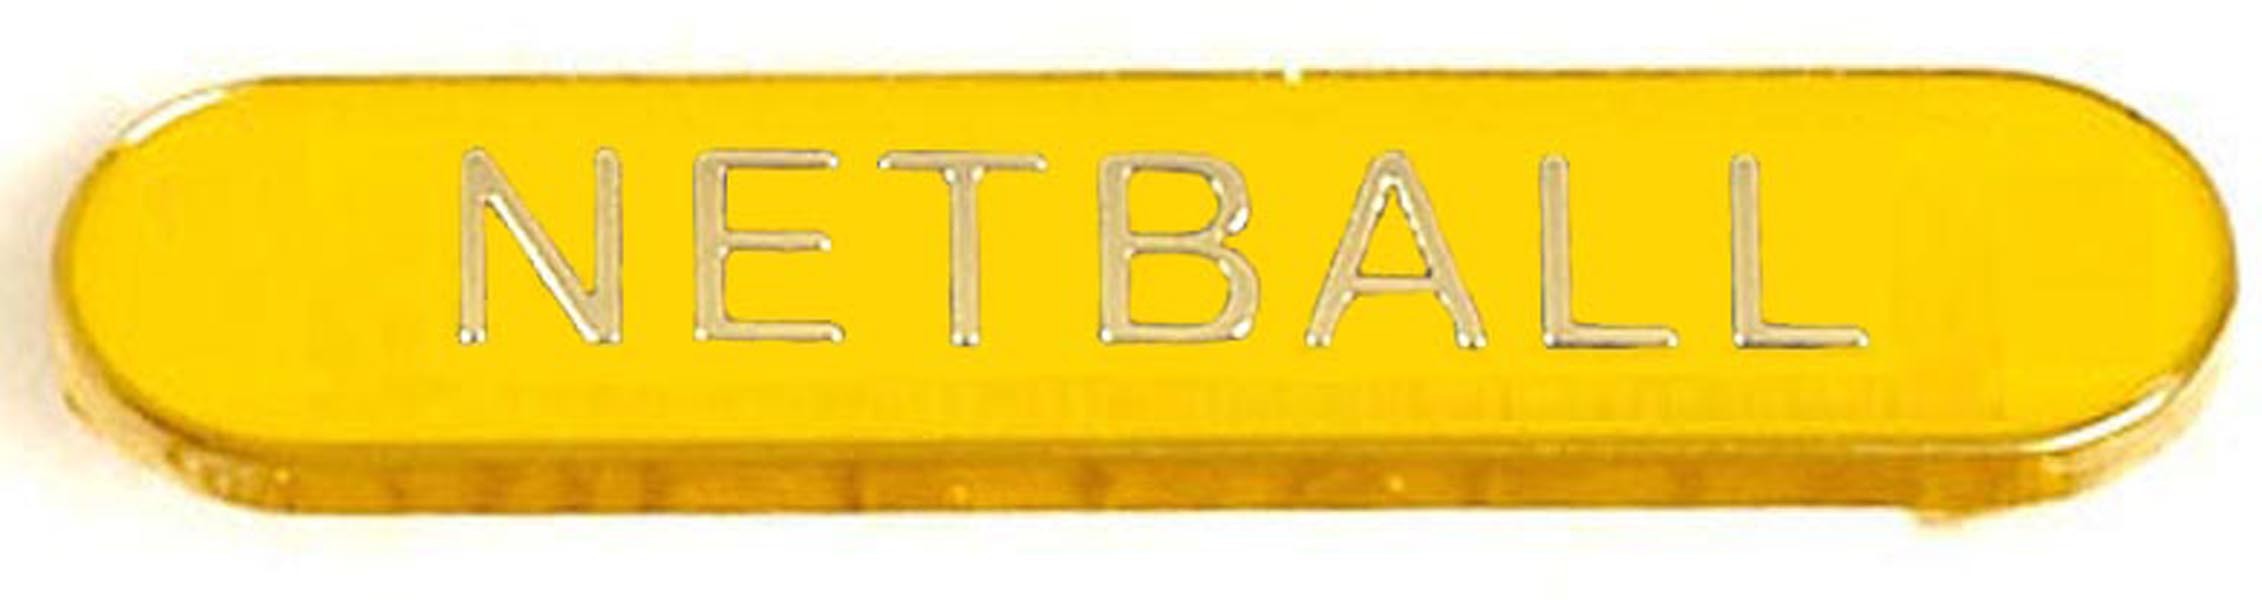 Yellow Netball Lapel Bar Badge 40mm x 8mm